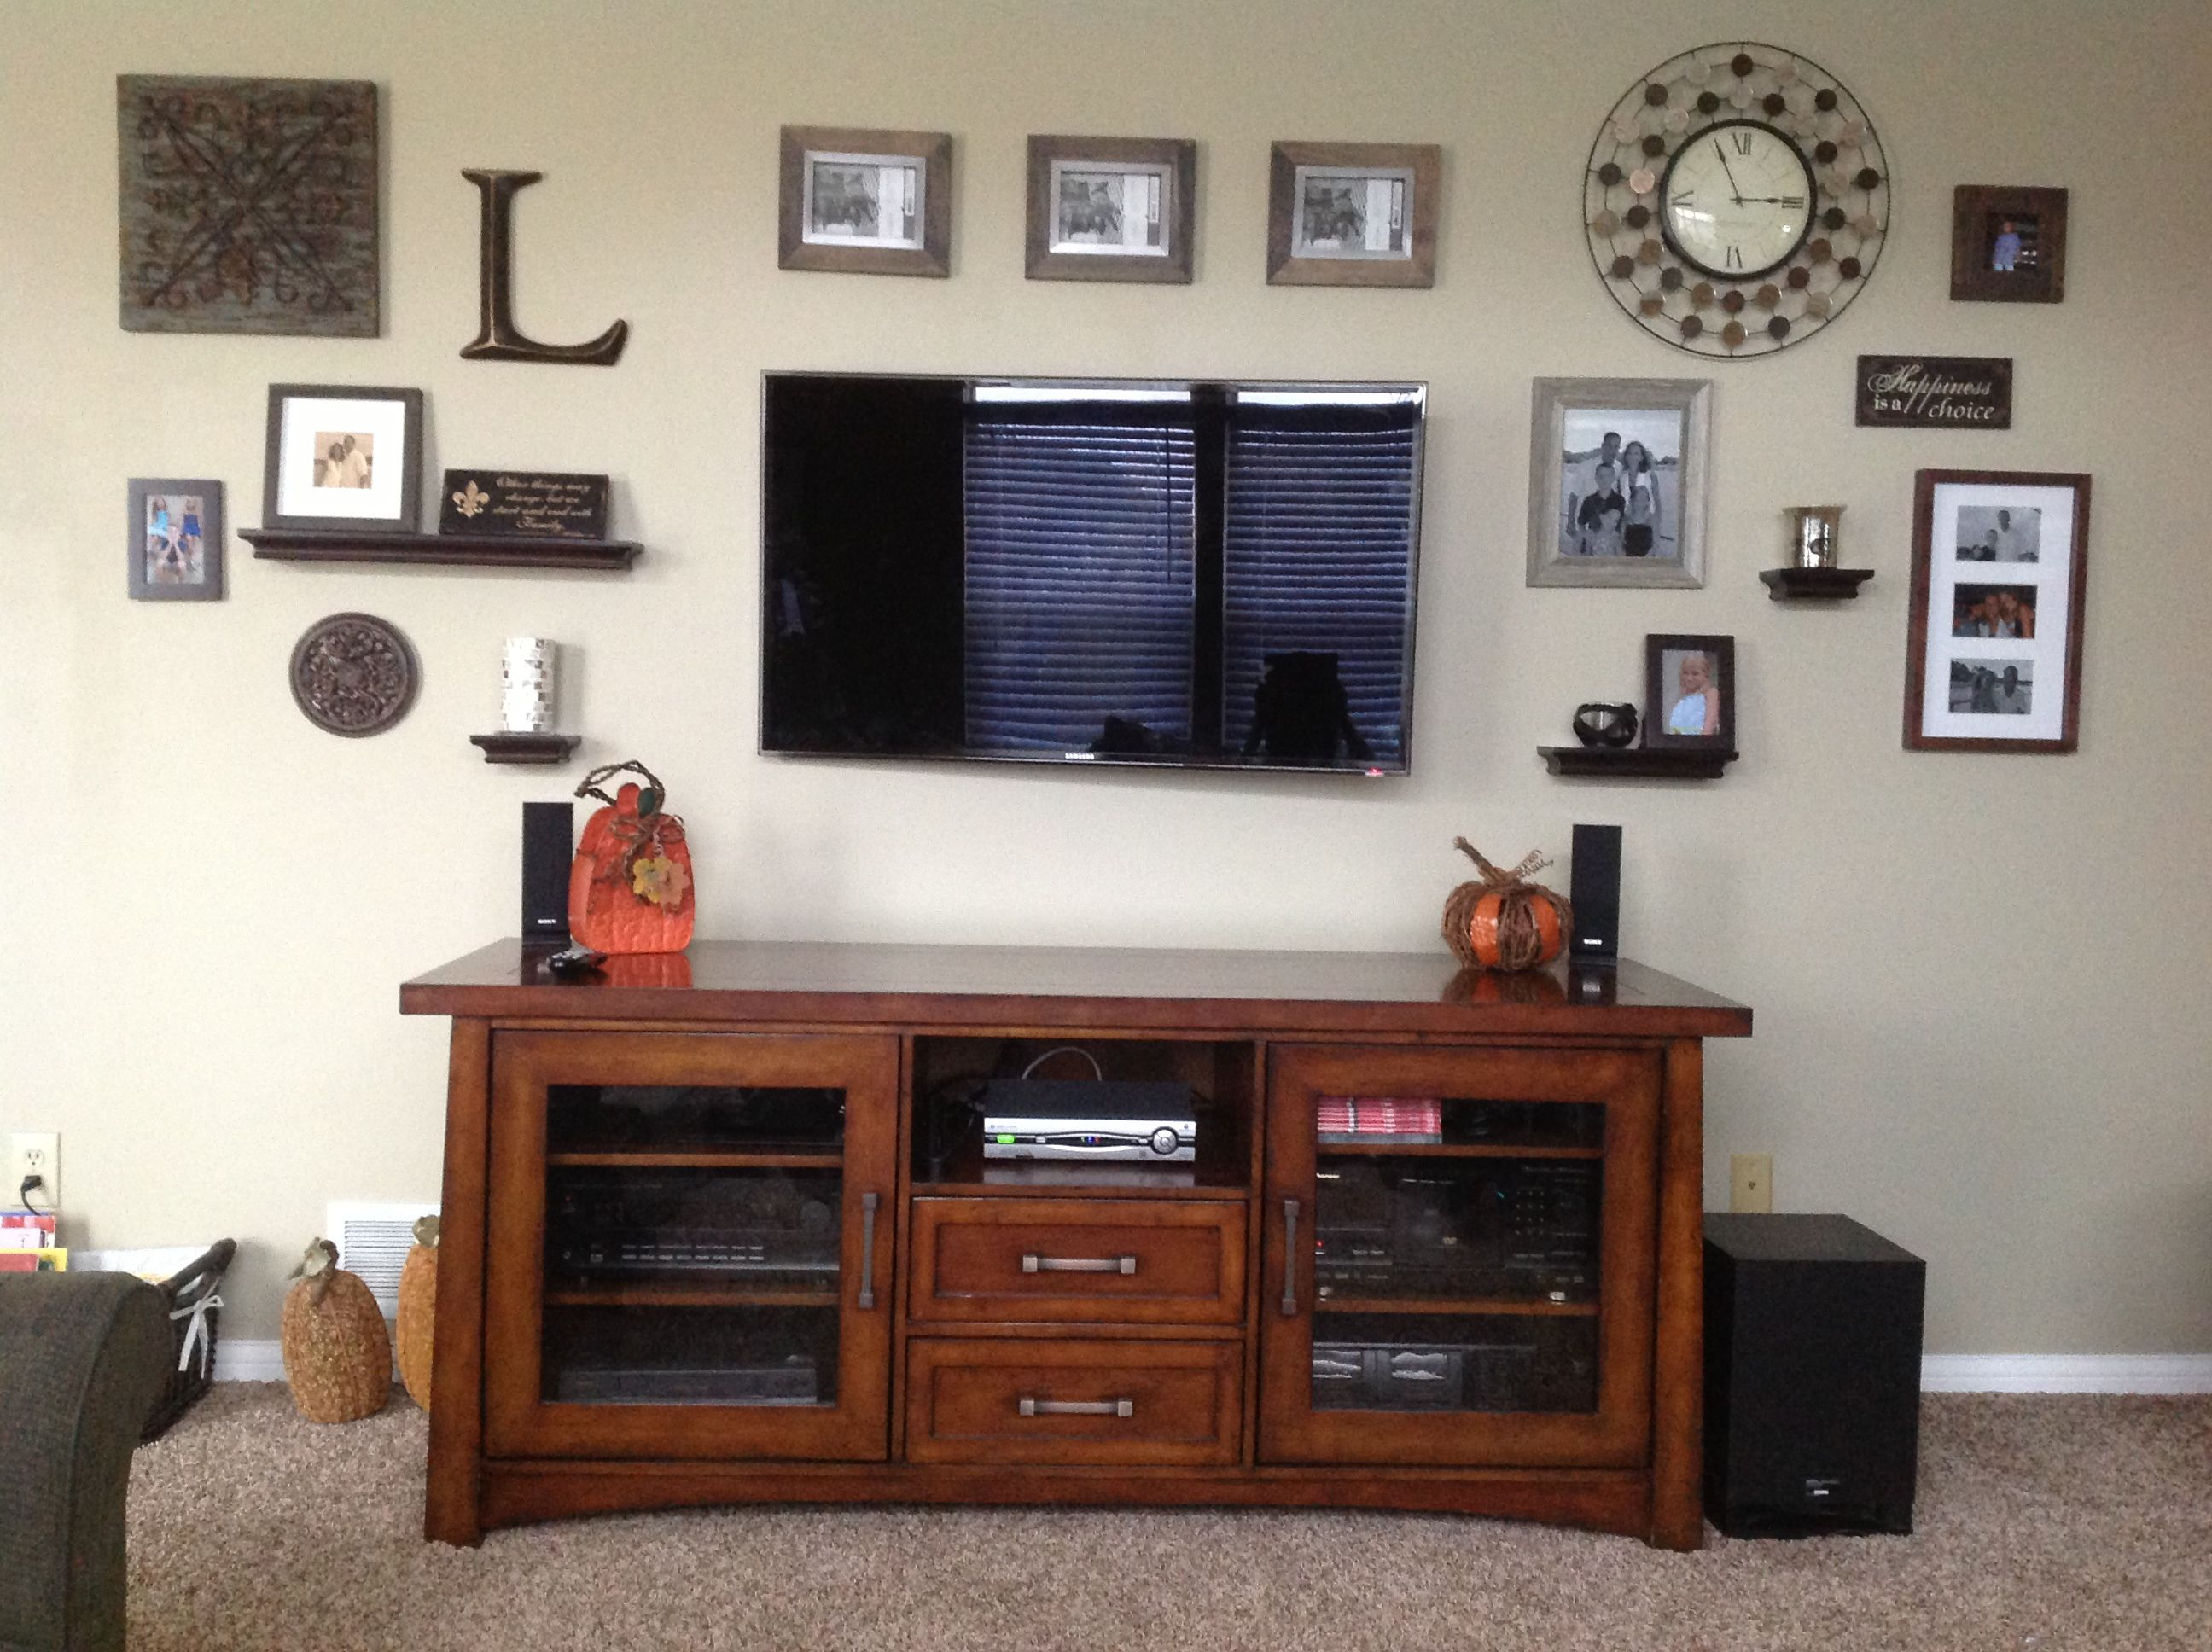 beautiful decorating around a flat screen tv with decorating around a flat screen tv part of decorating around a flat screen tv at tiny houses and